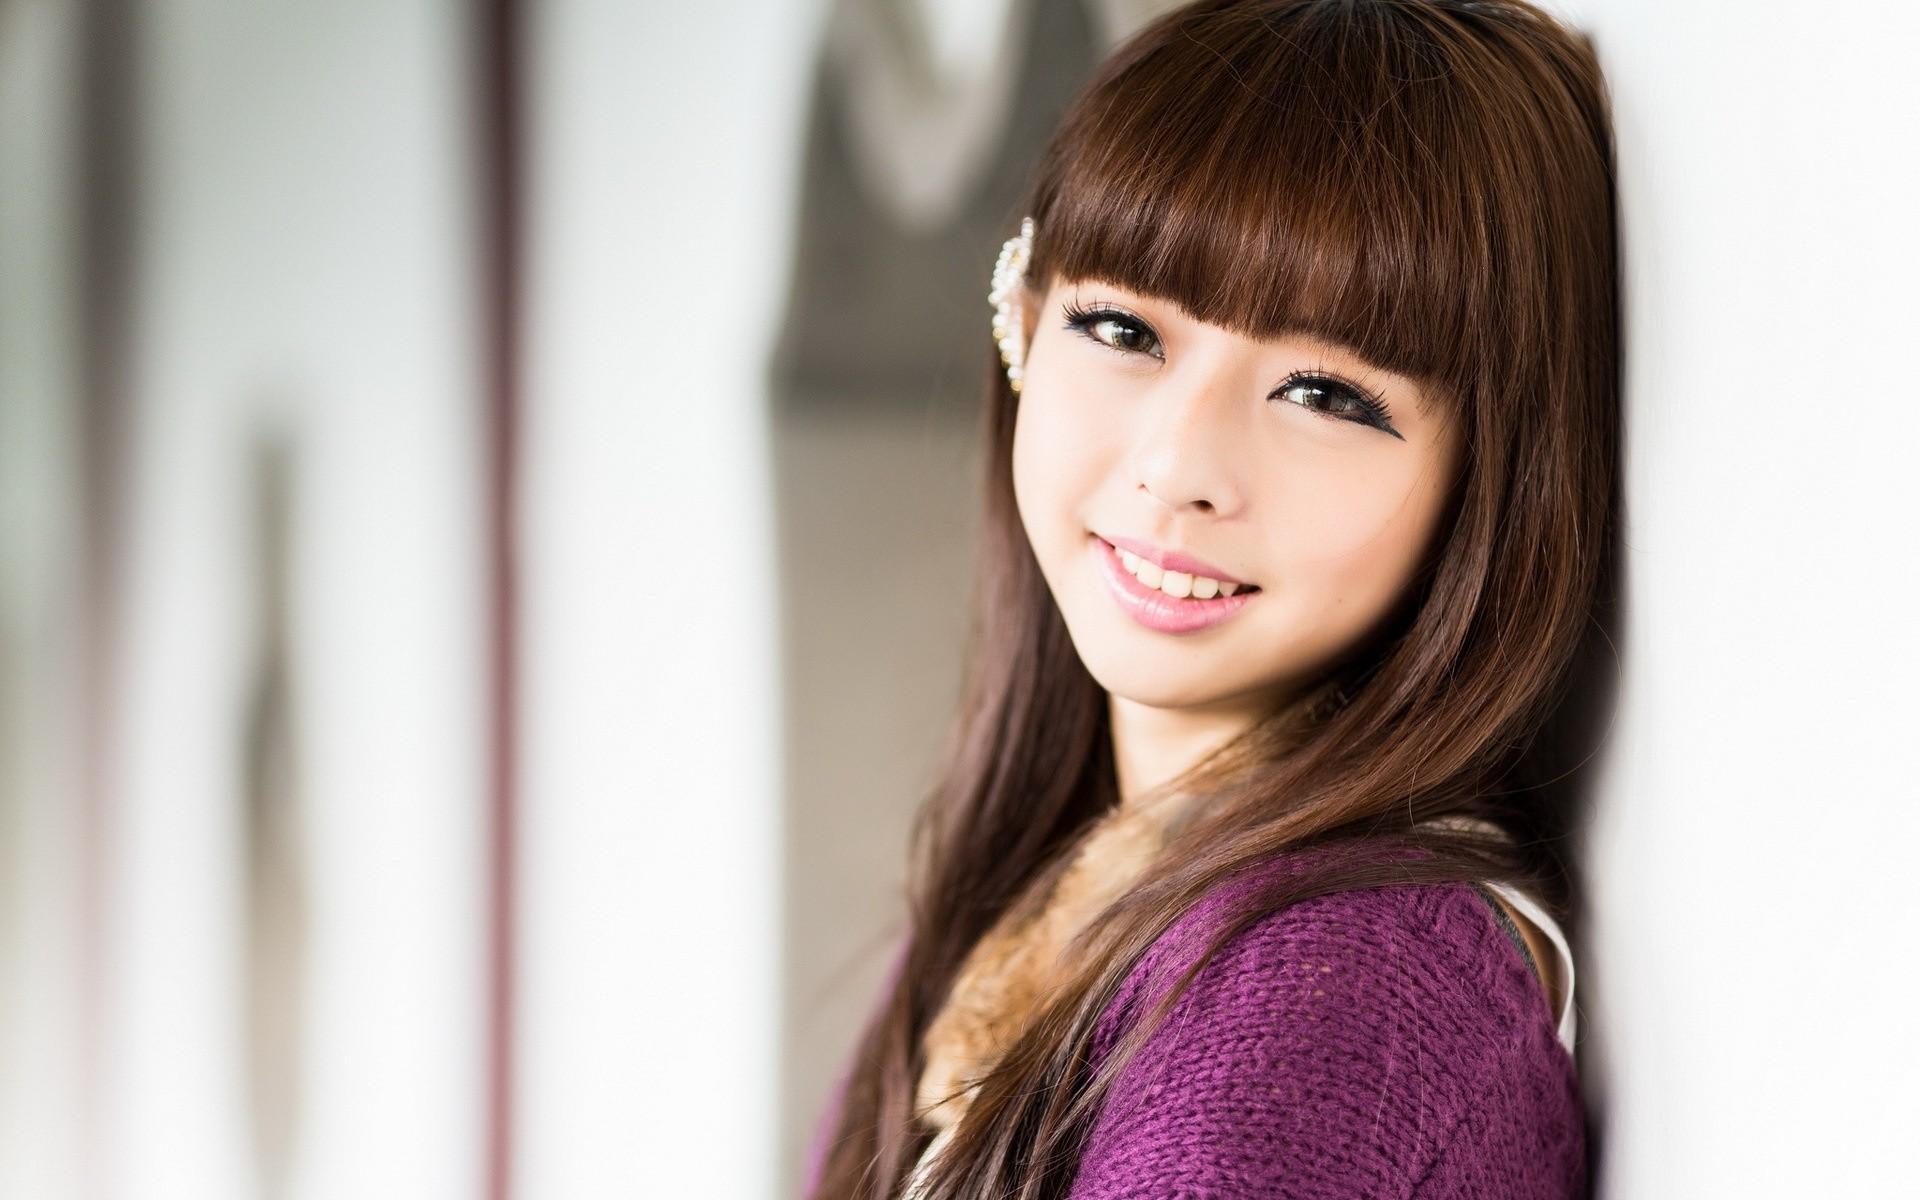 Cute Asian Girl Hd Wallpaper Cute Asian Girl Hd Wallpaper - Asian Girls , HD Wallpaper & Backgrounds